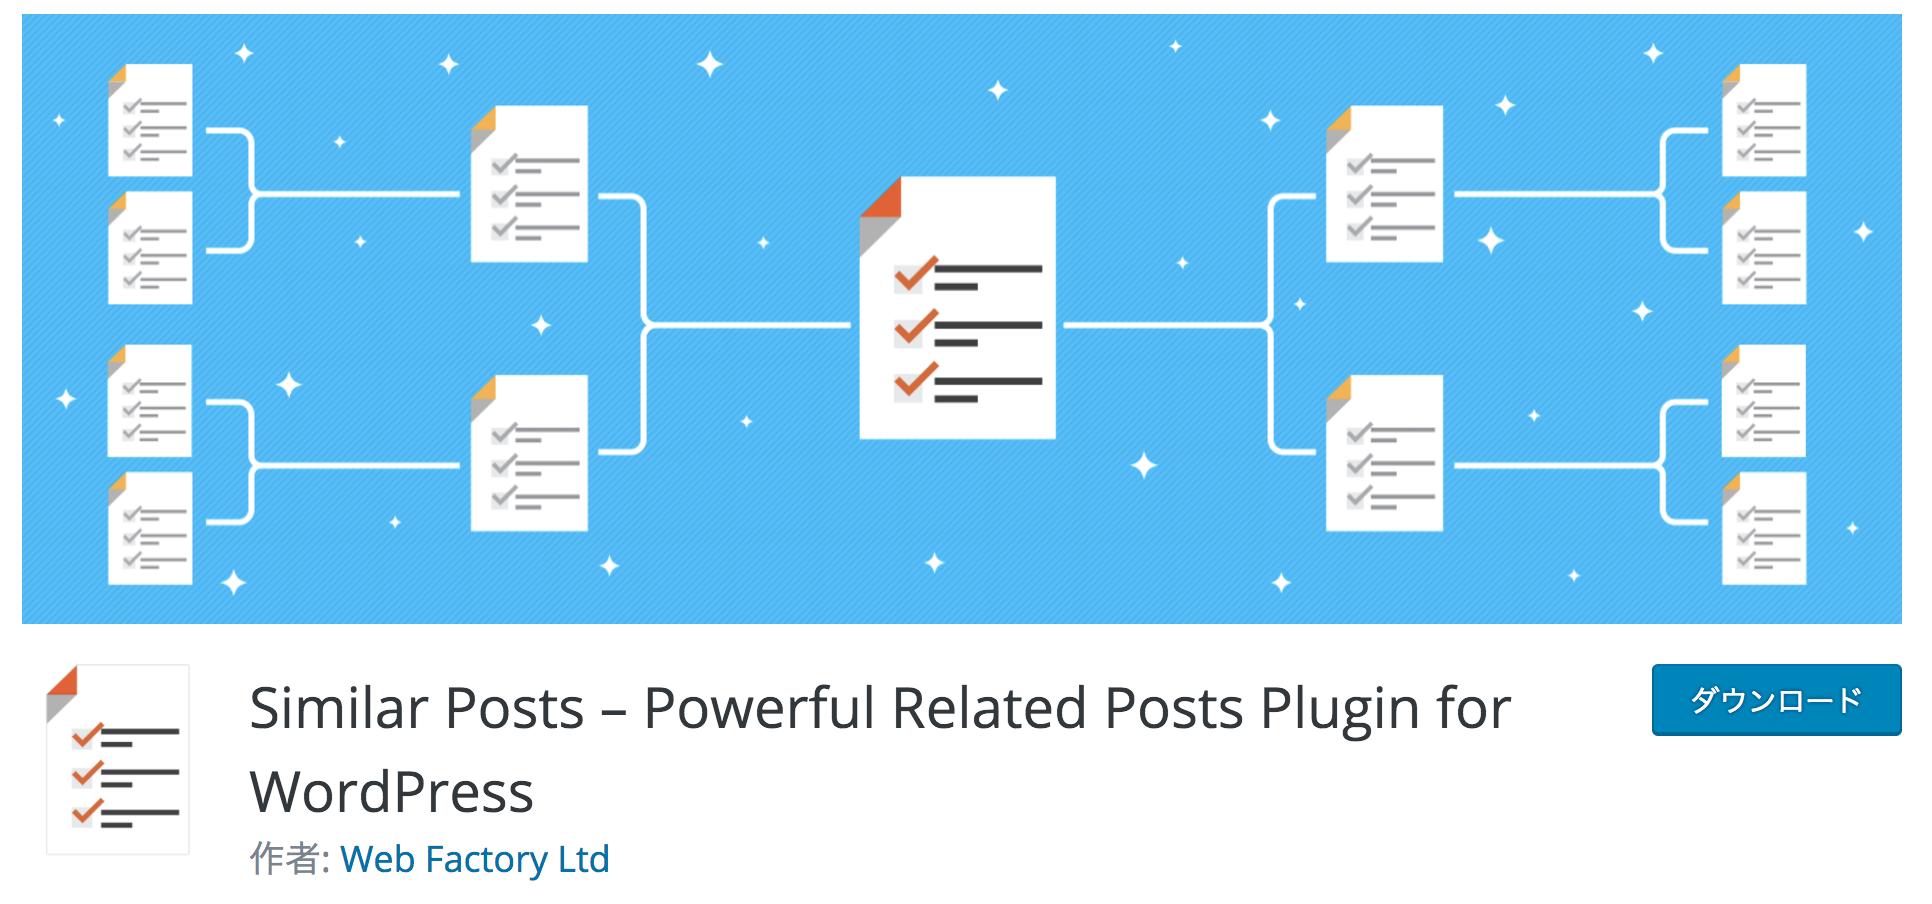 similarpost - WordPressのプラグインがインストール・新規追加できない時の対処法